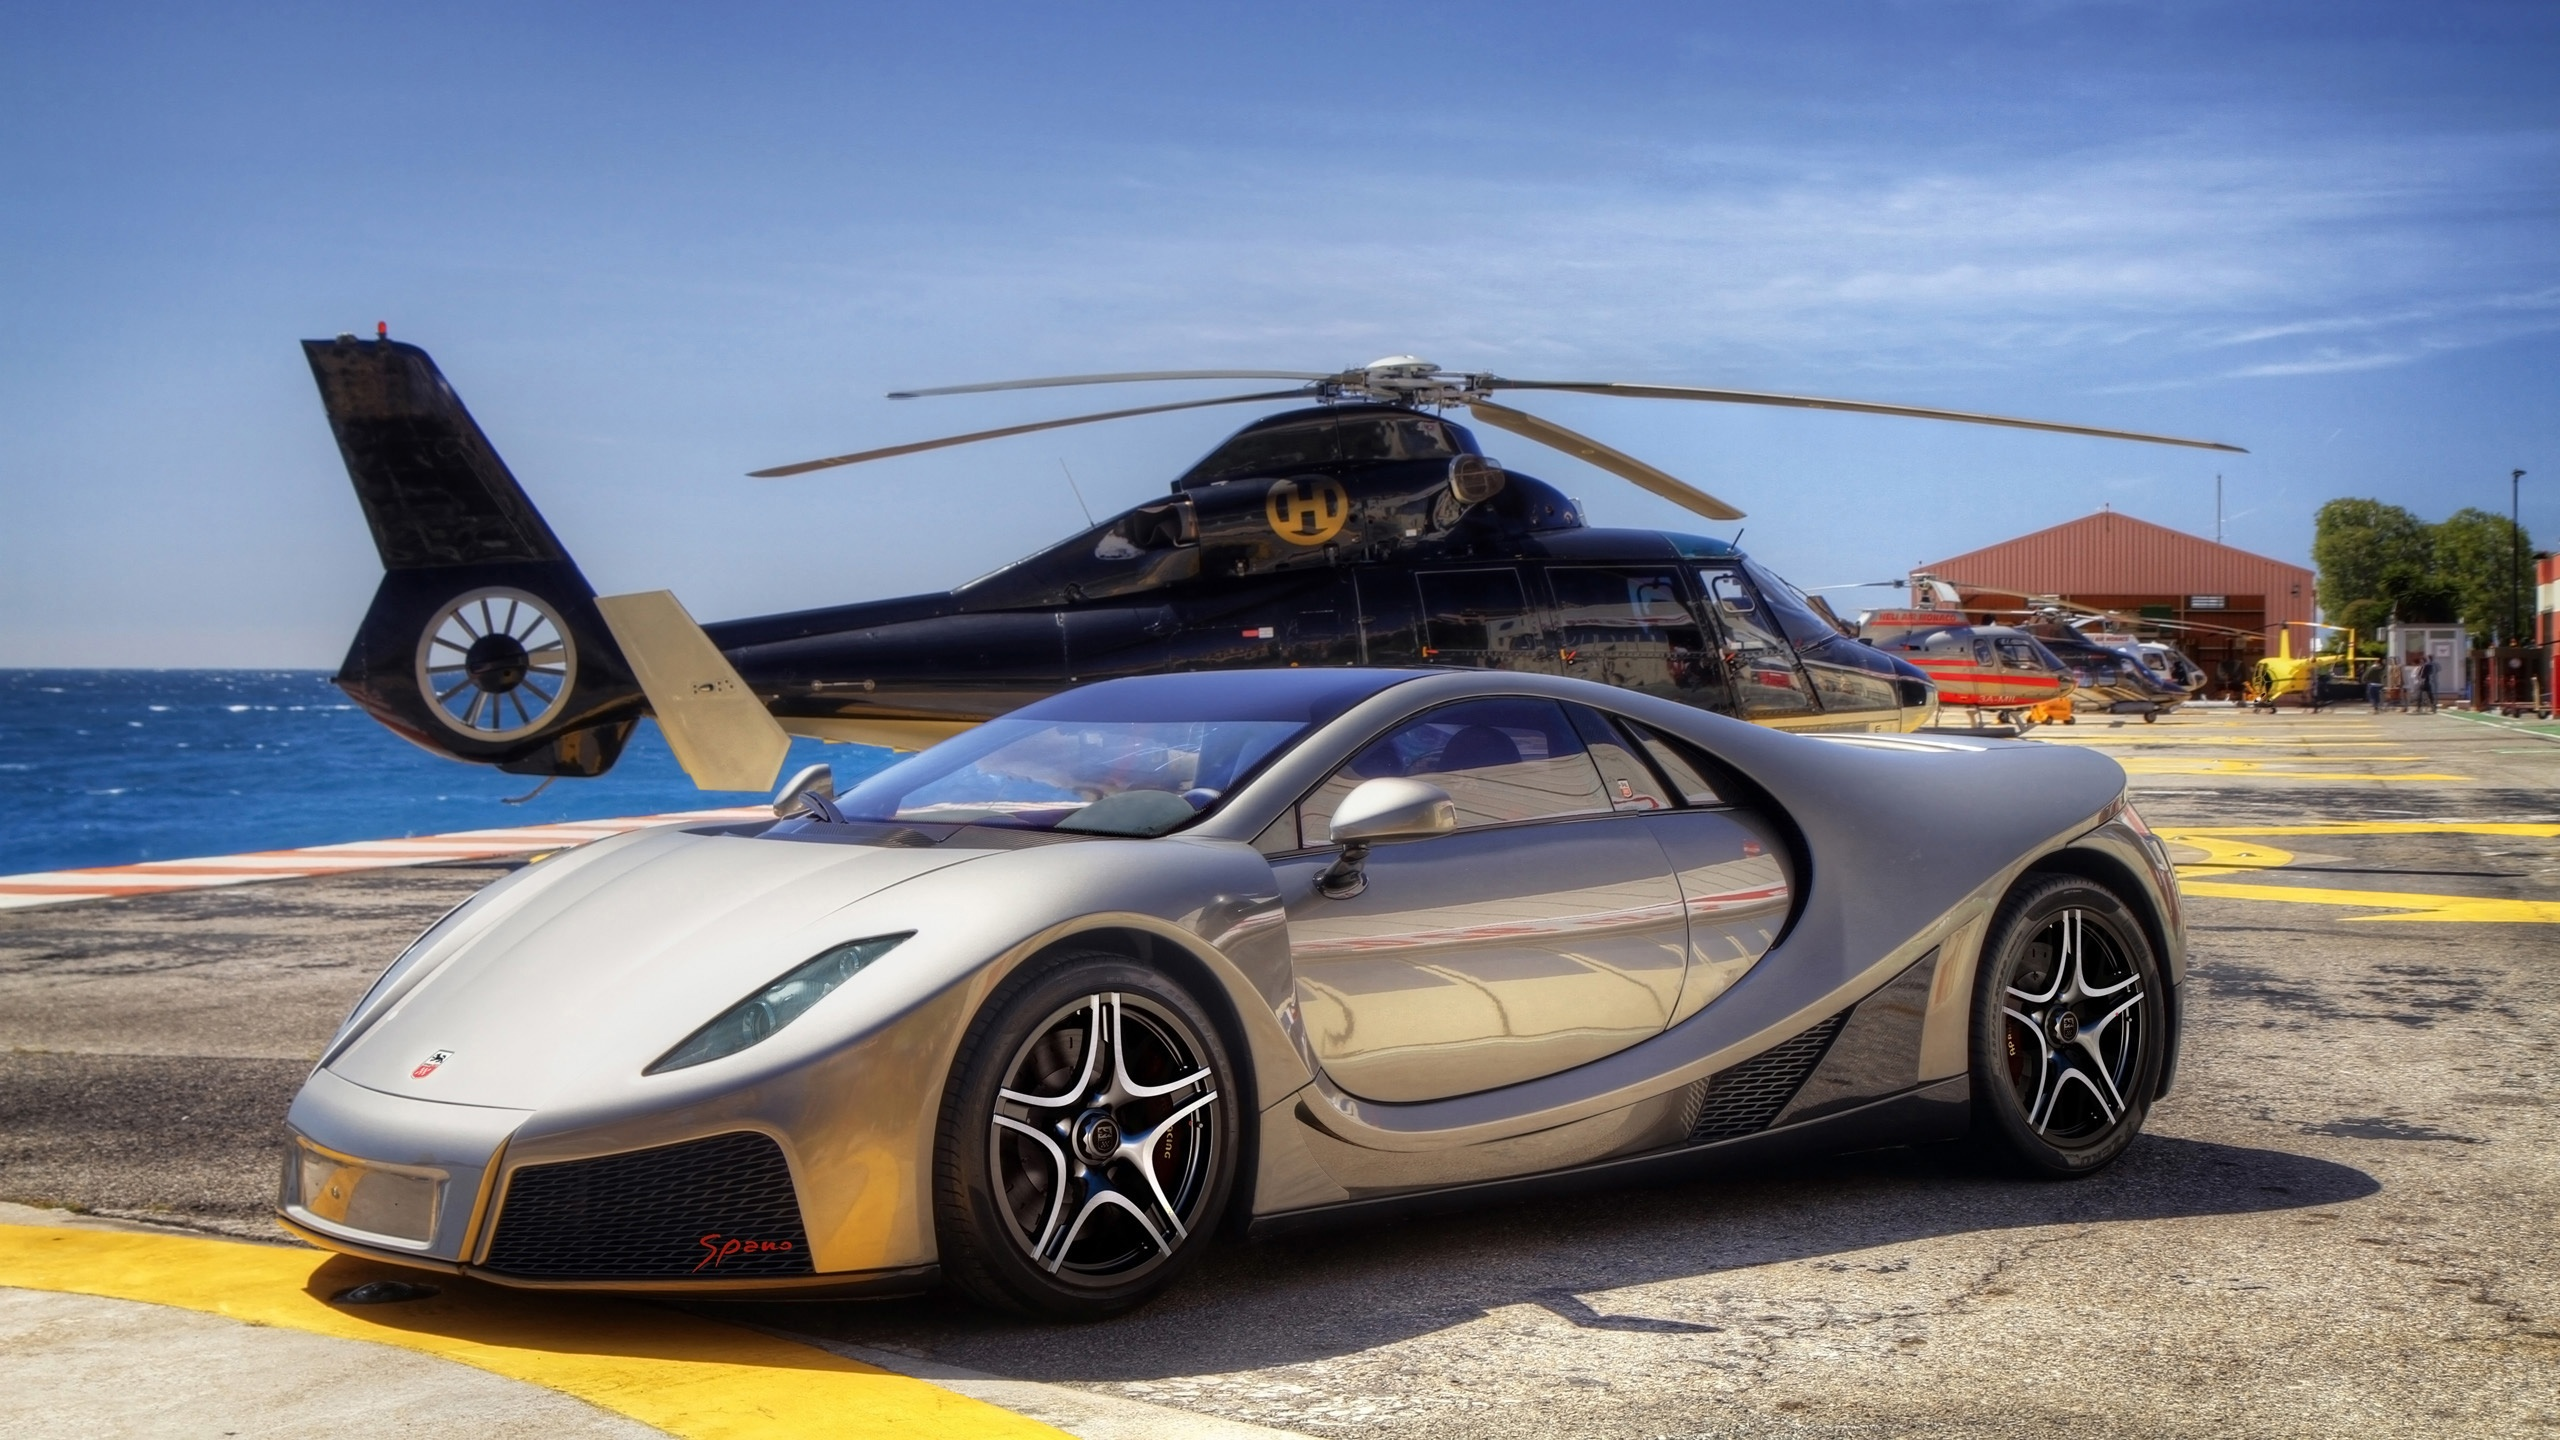 Free Download 2014 Gta Spano Silver Wallpaper Hd Car